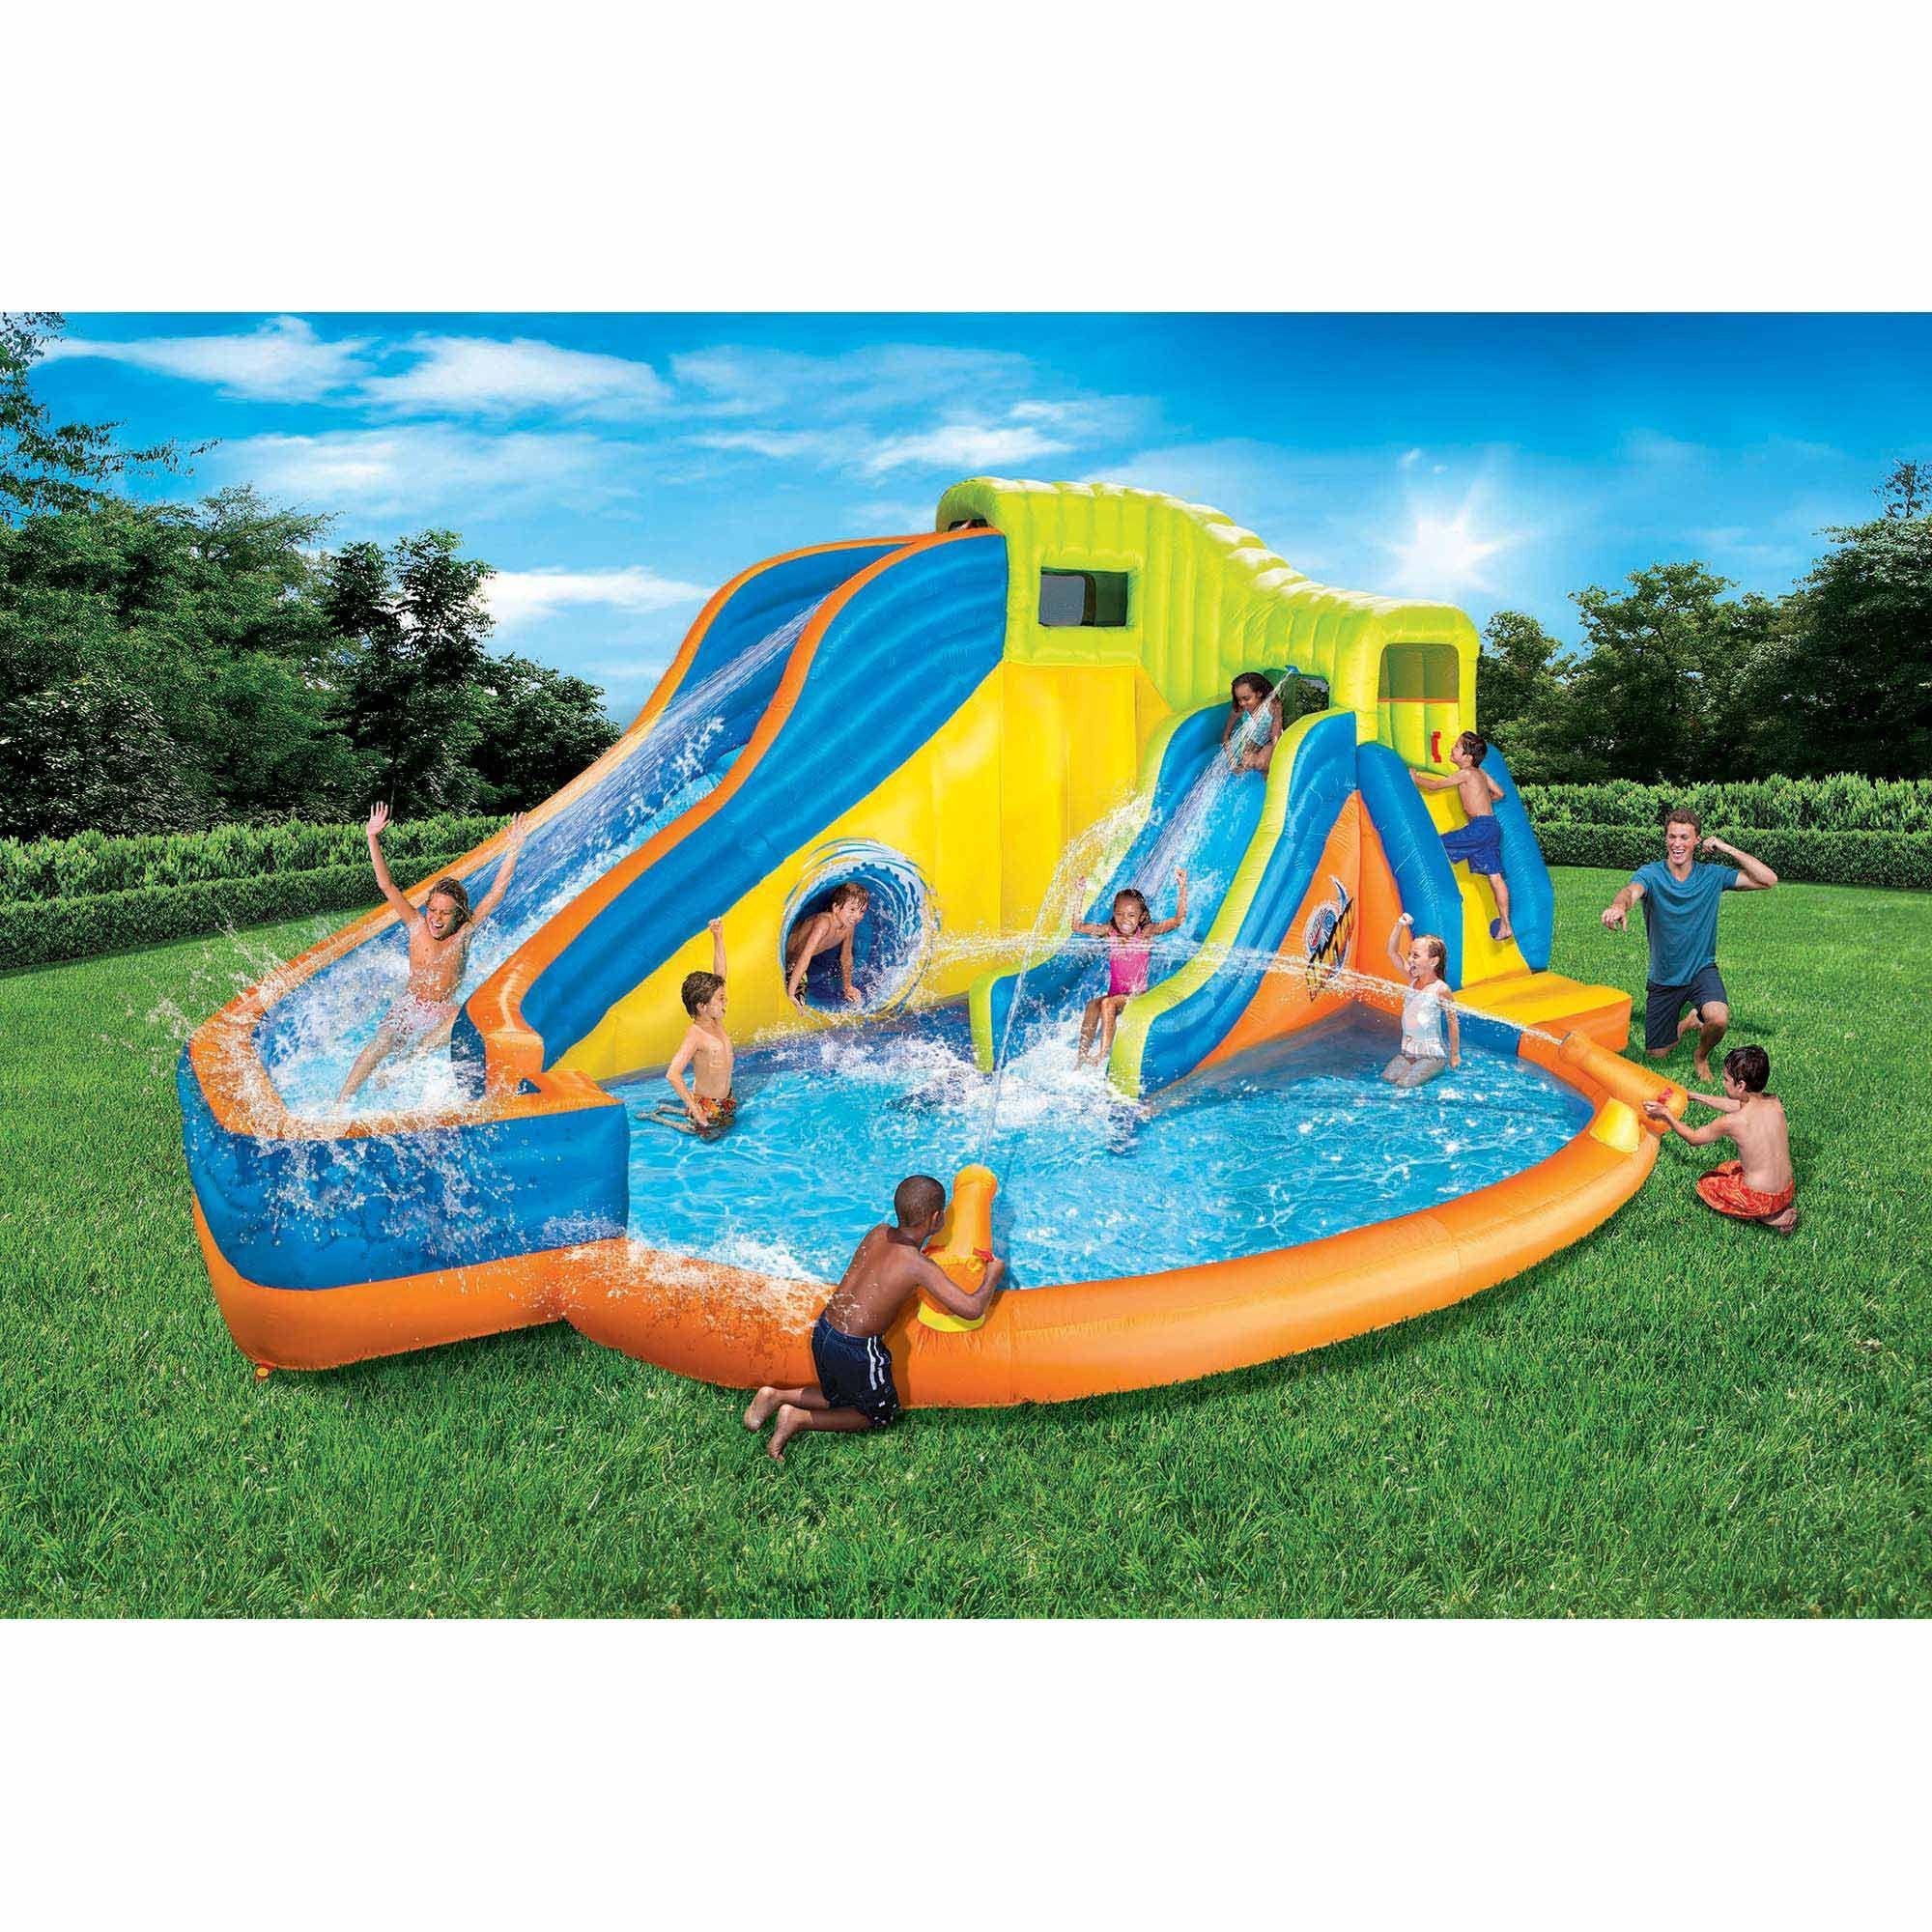 Banzai Pipeline Twist Kids Inflatable Outdoor Water Pool